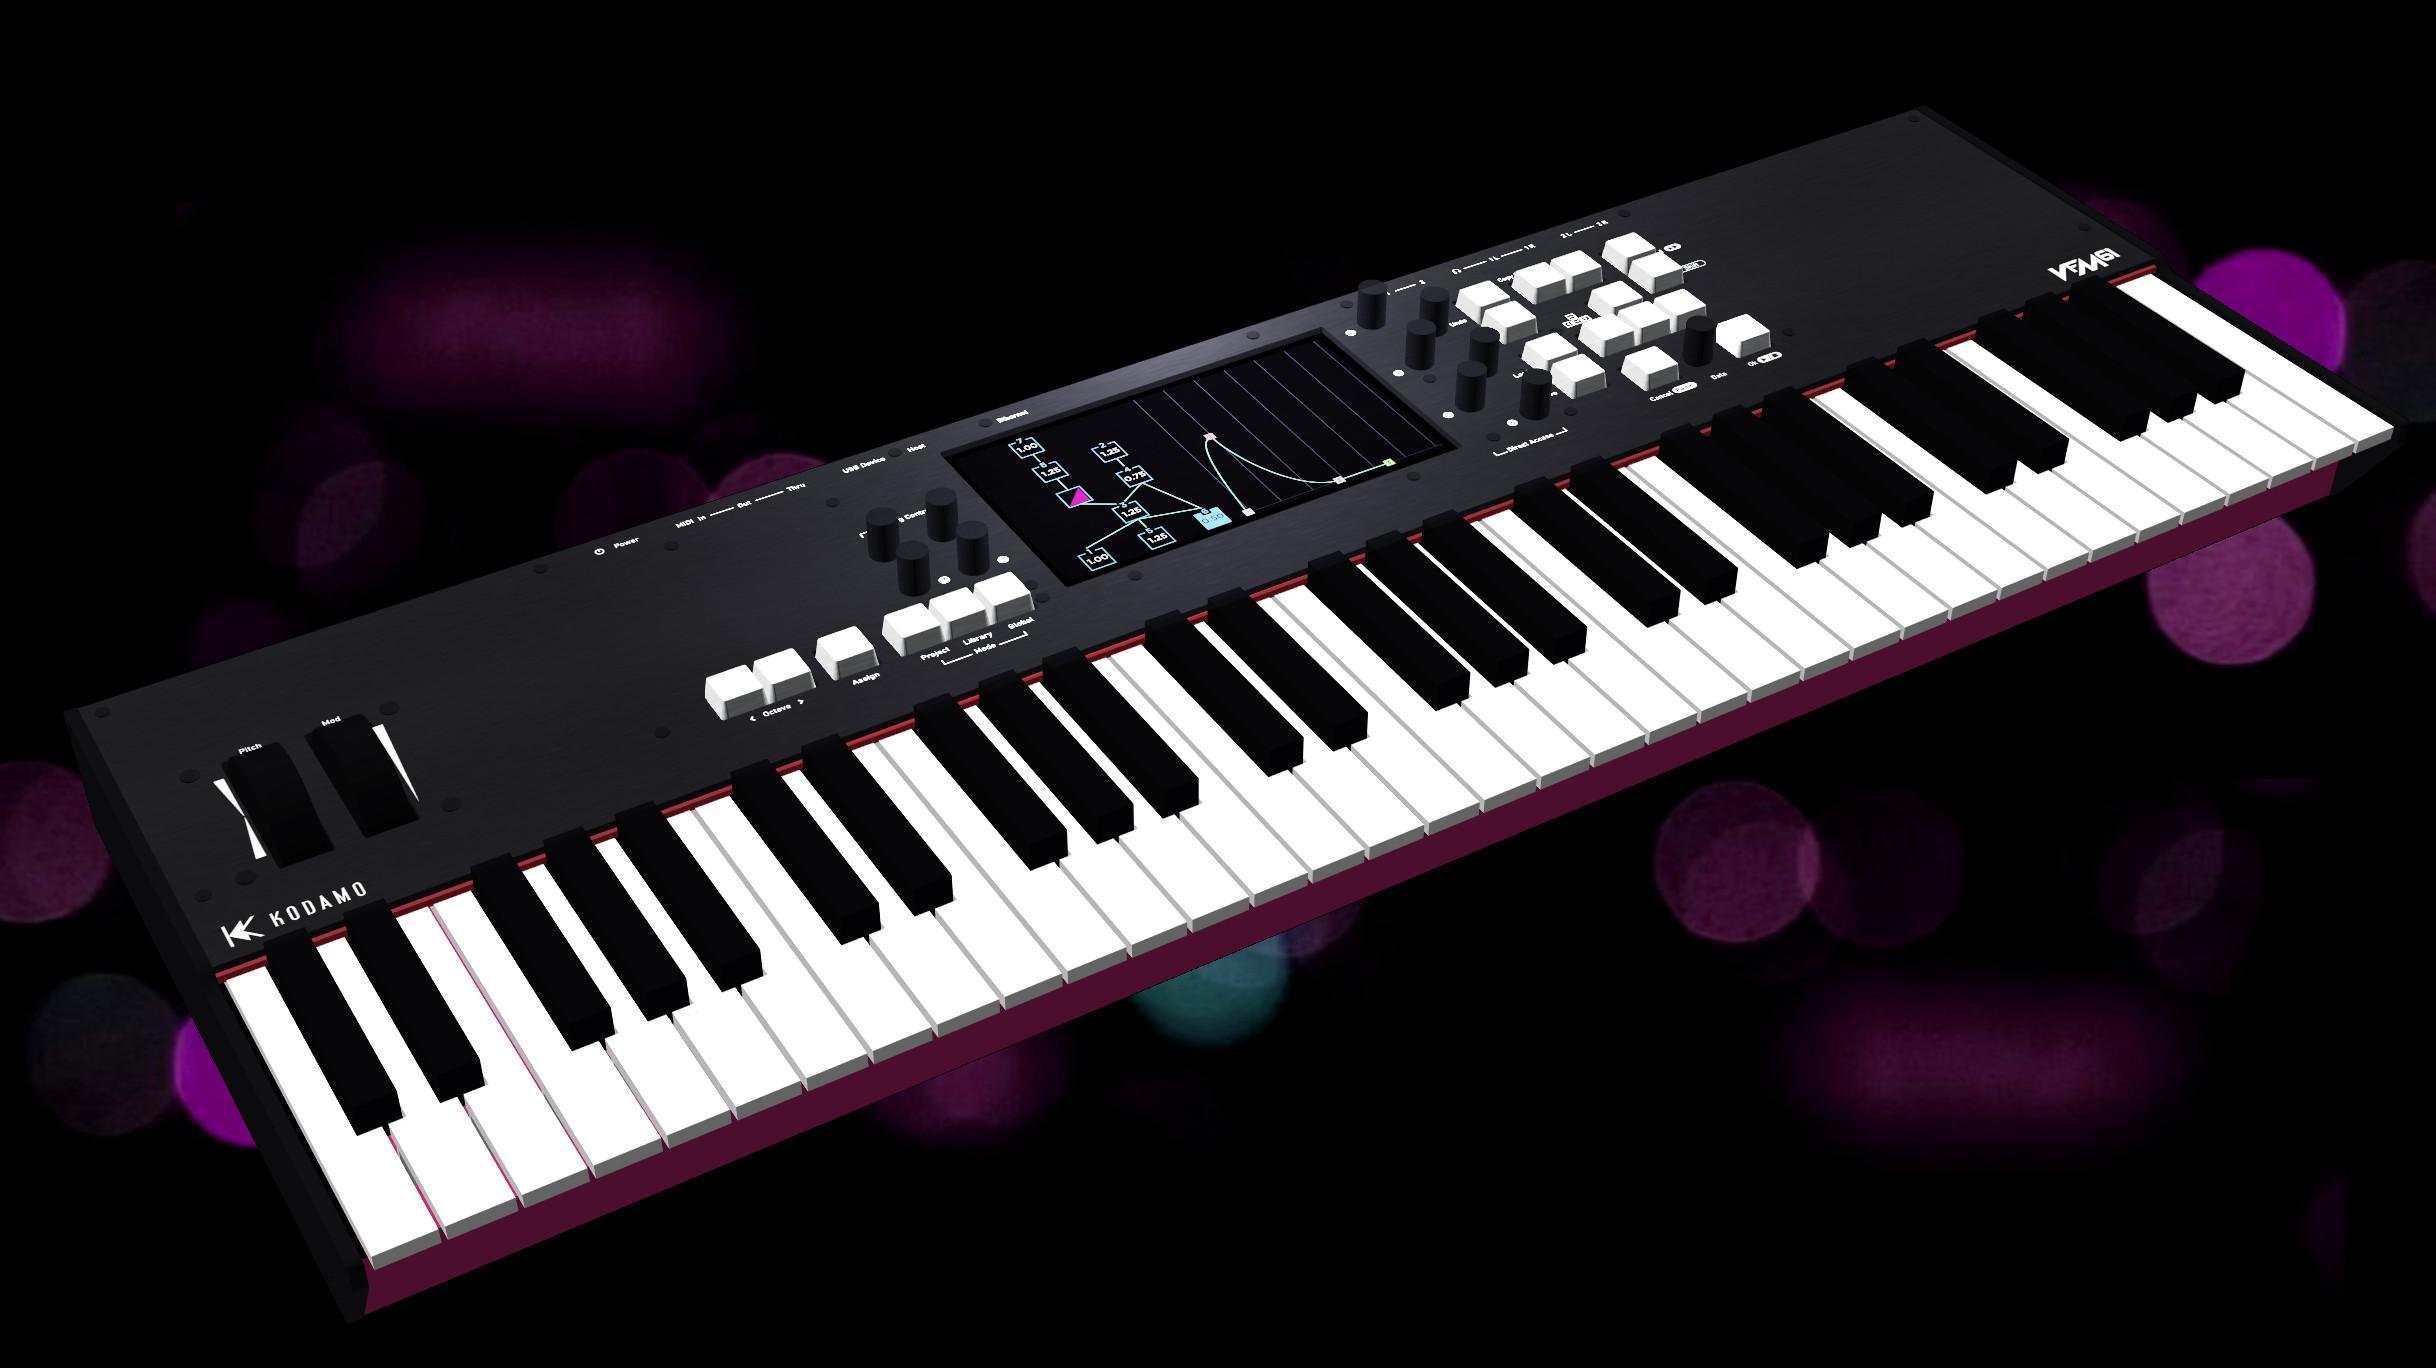 VFM keyboard 3D render